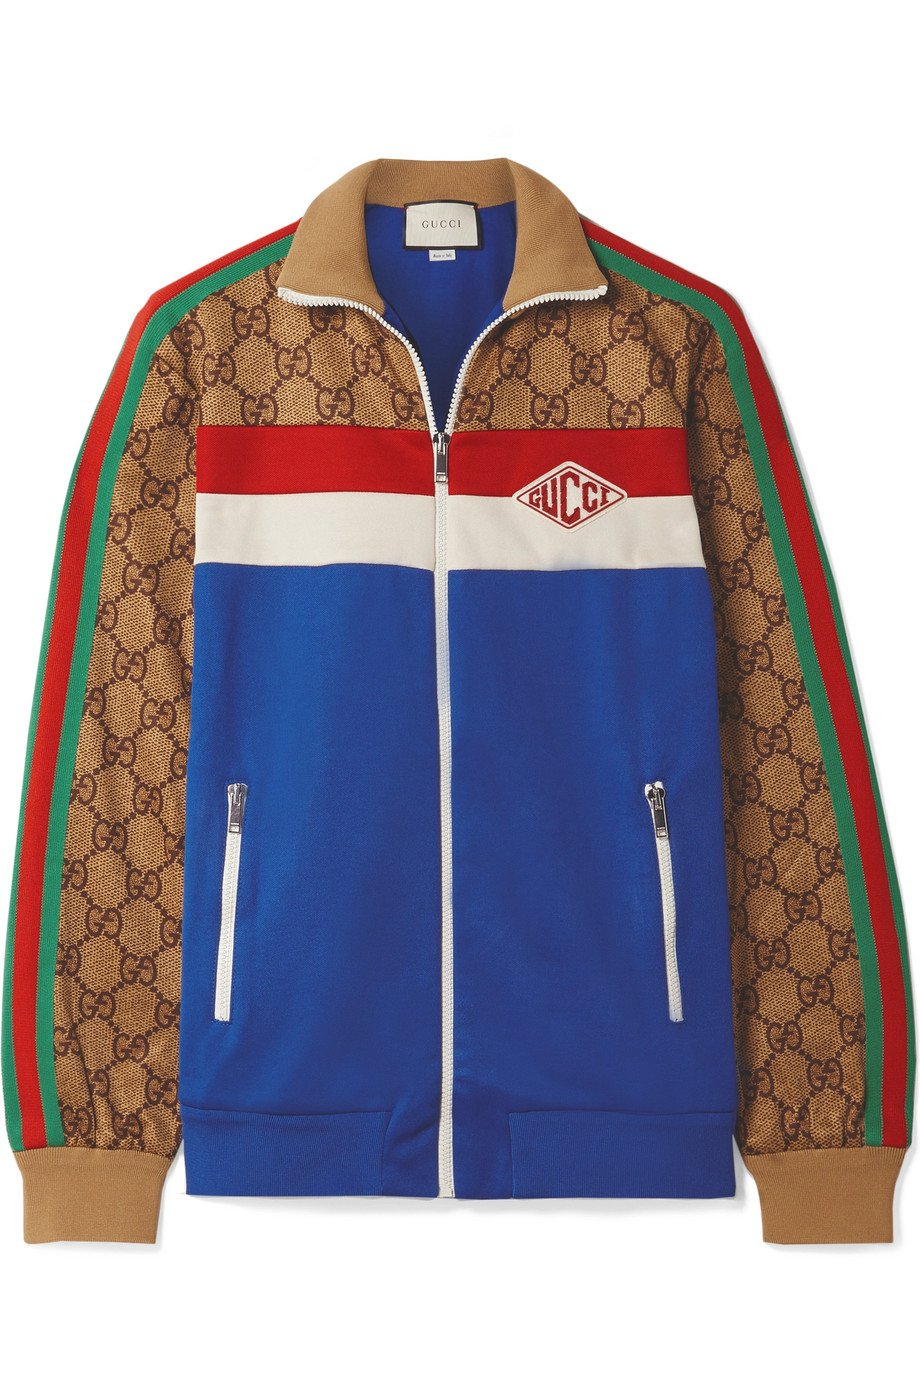 Gucci | Printed tech-jersey track jacket | NET-A-PORTER.COM